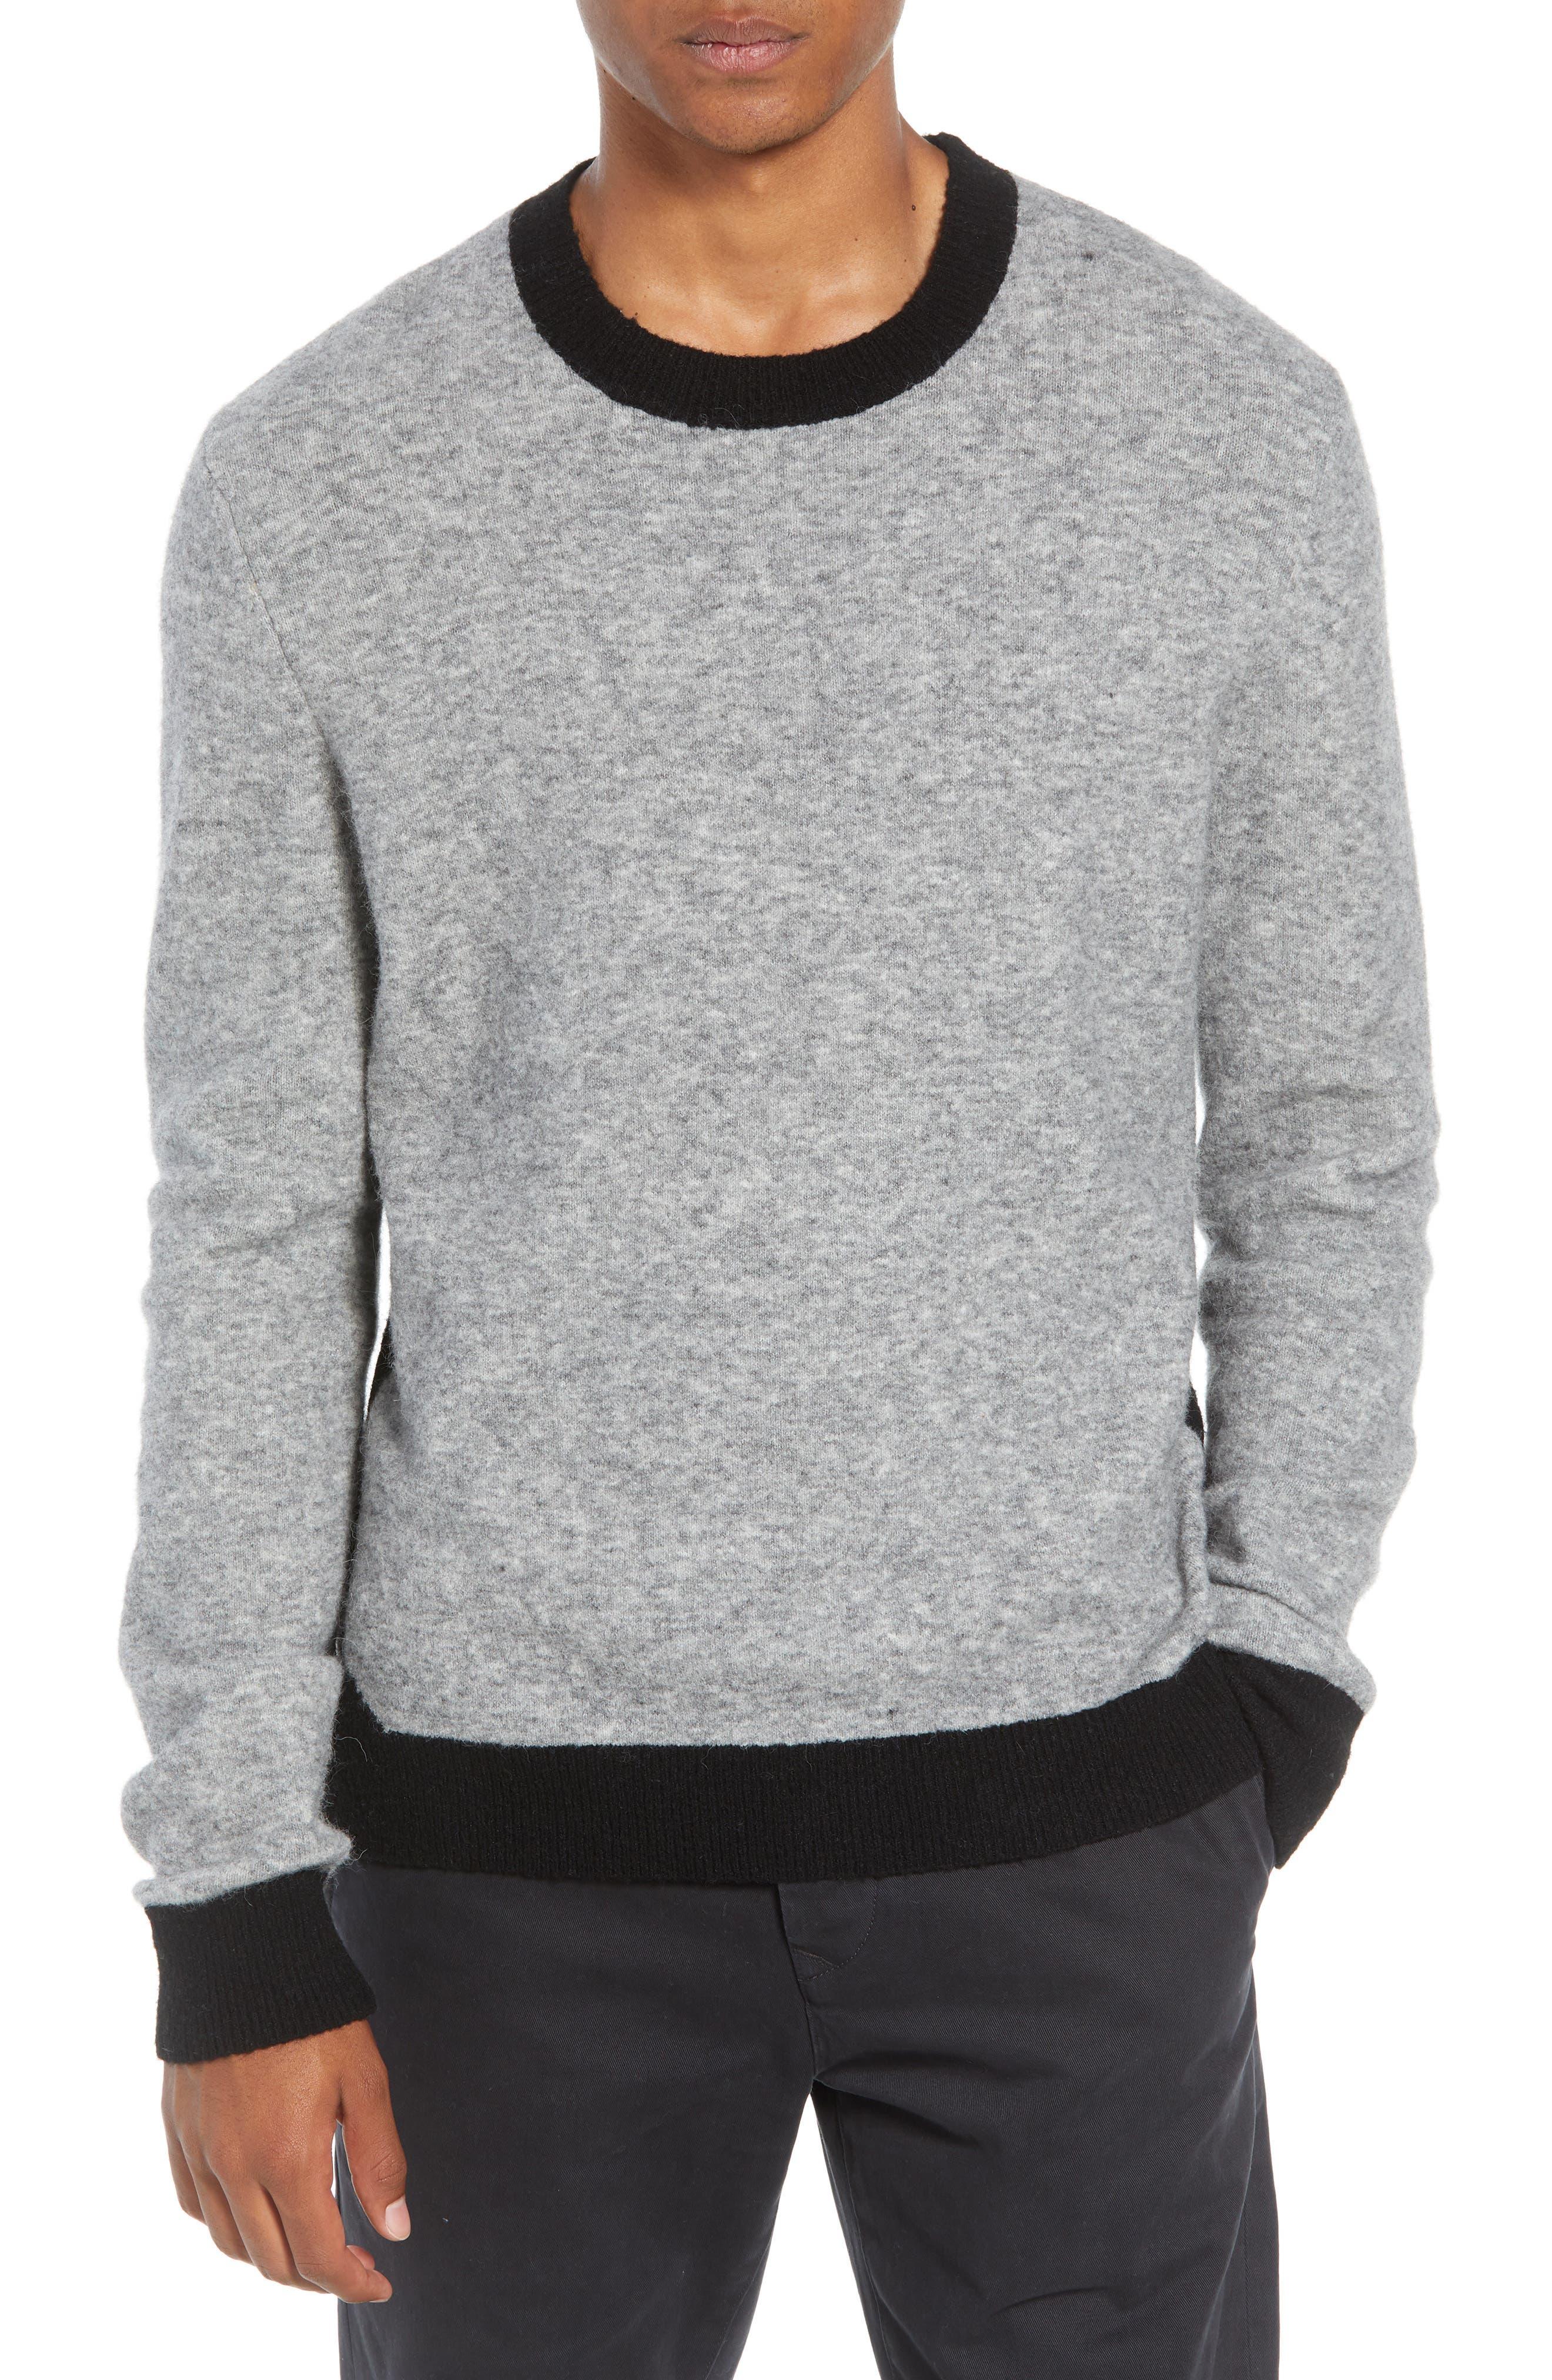 Clermont Slim Fit Crewneck Sweater,                             Main thumbnail 1, color,                             LIGHT HEATHER GREY